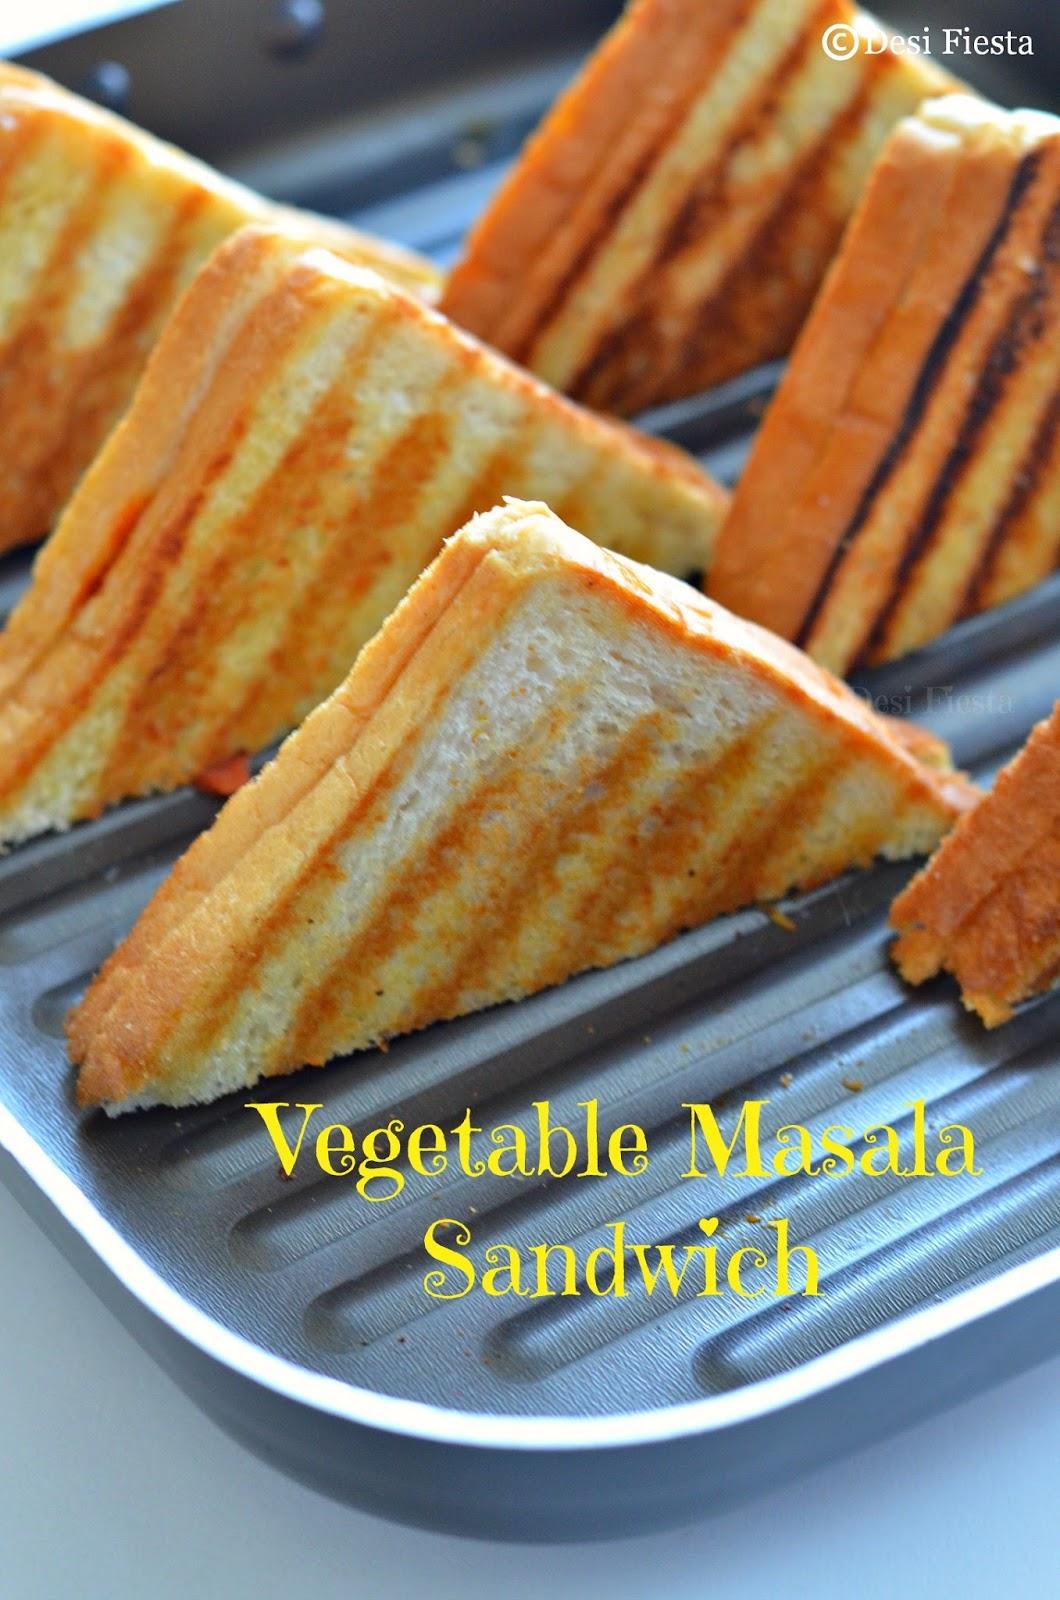 Grilled vegetable sandwhich